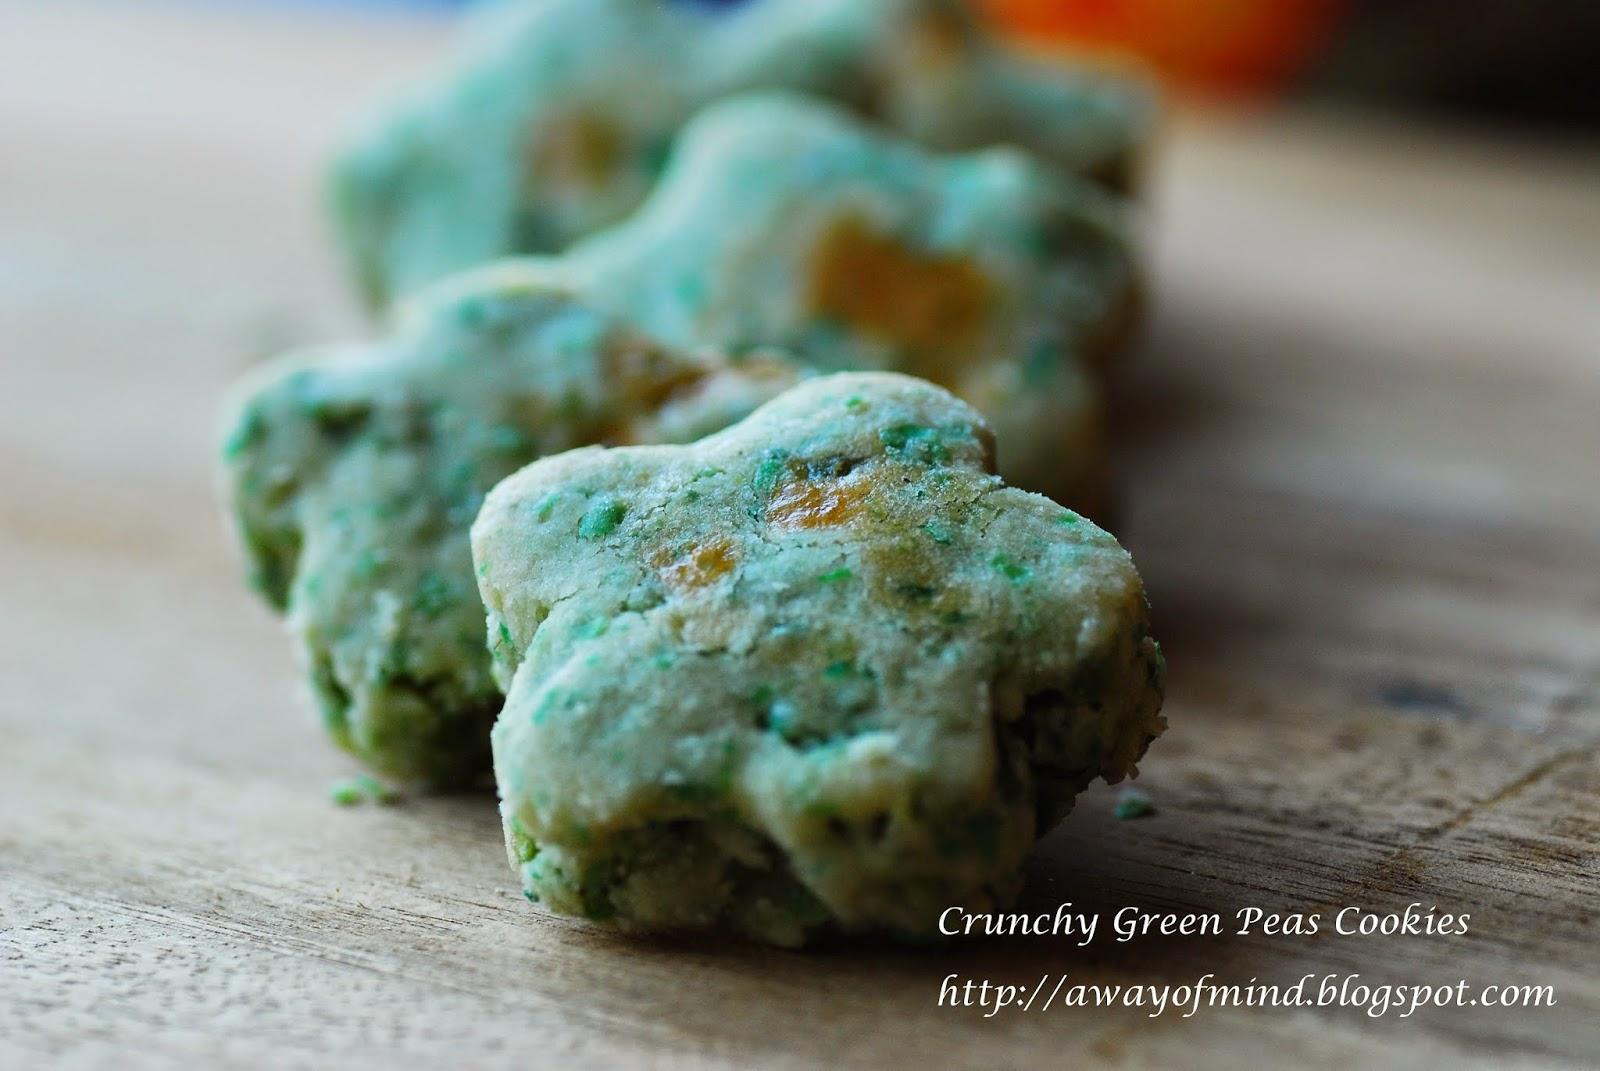 Awayofmind Bakery House: Crunchy Green Peas Cookies 香脆青豆饼